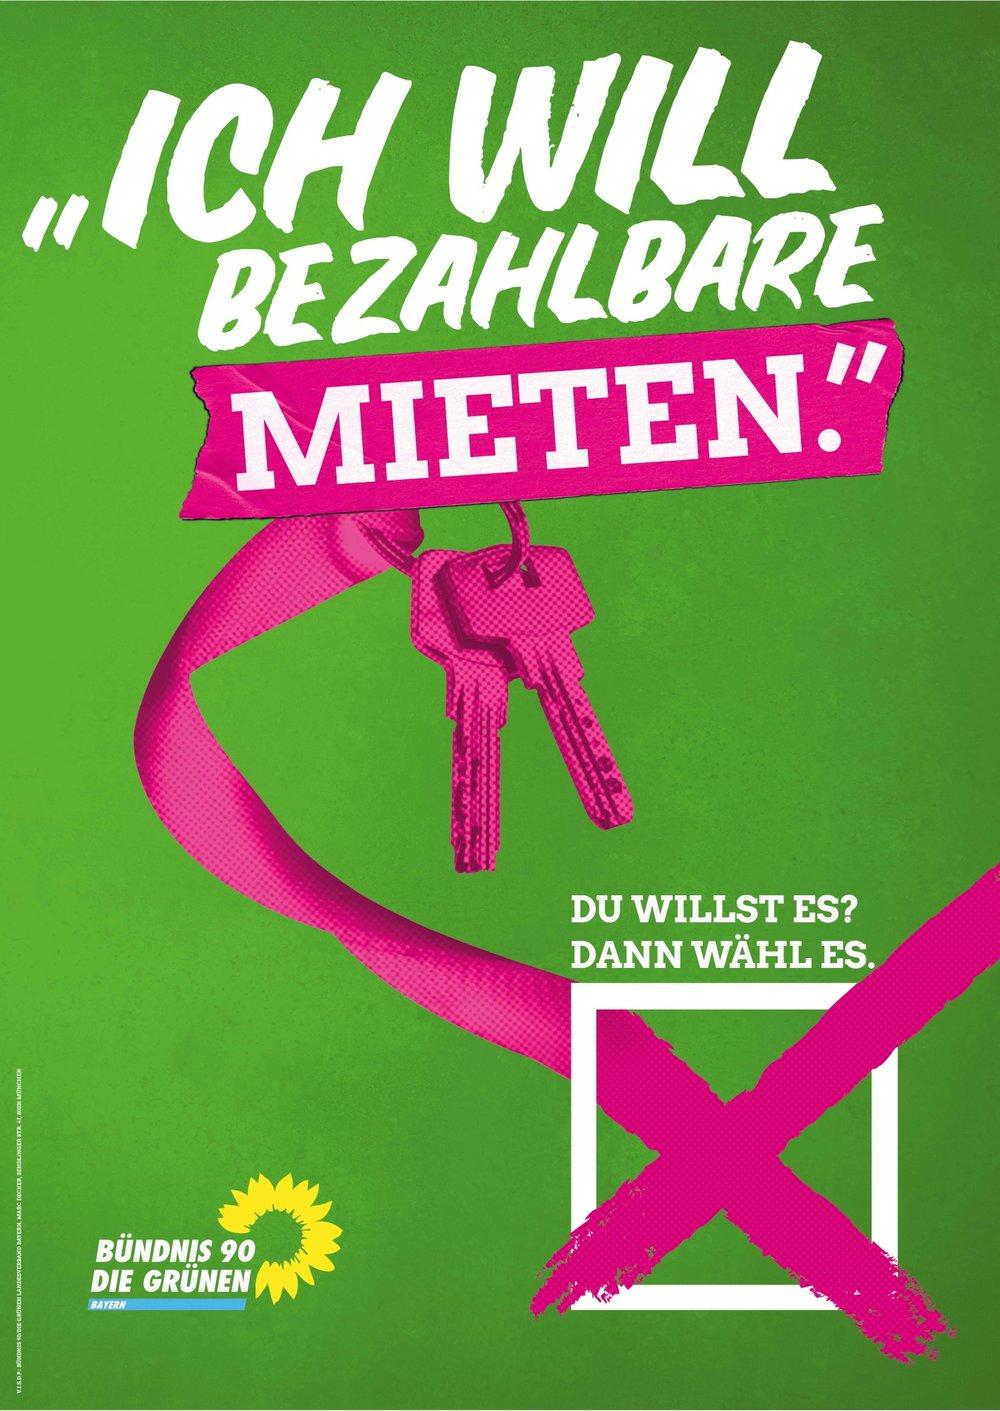 Grüne_Landtagswahl2018_Miete.jpg